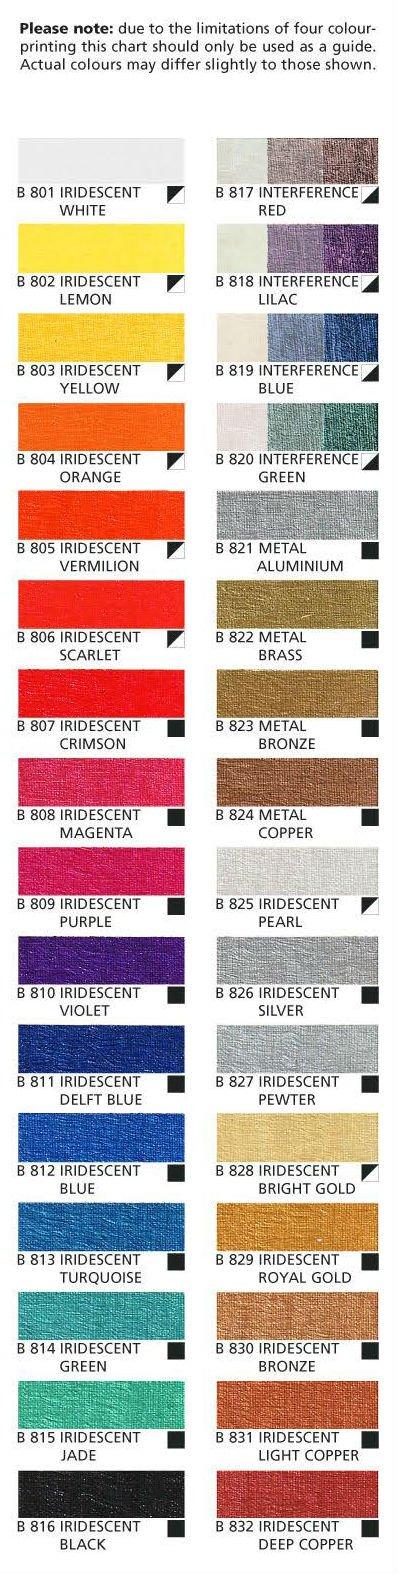 Old Holland 60ML Iridescent Acrylics